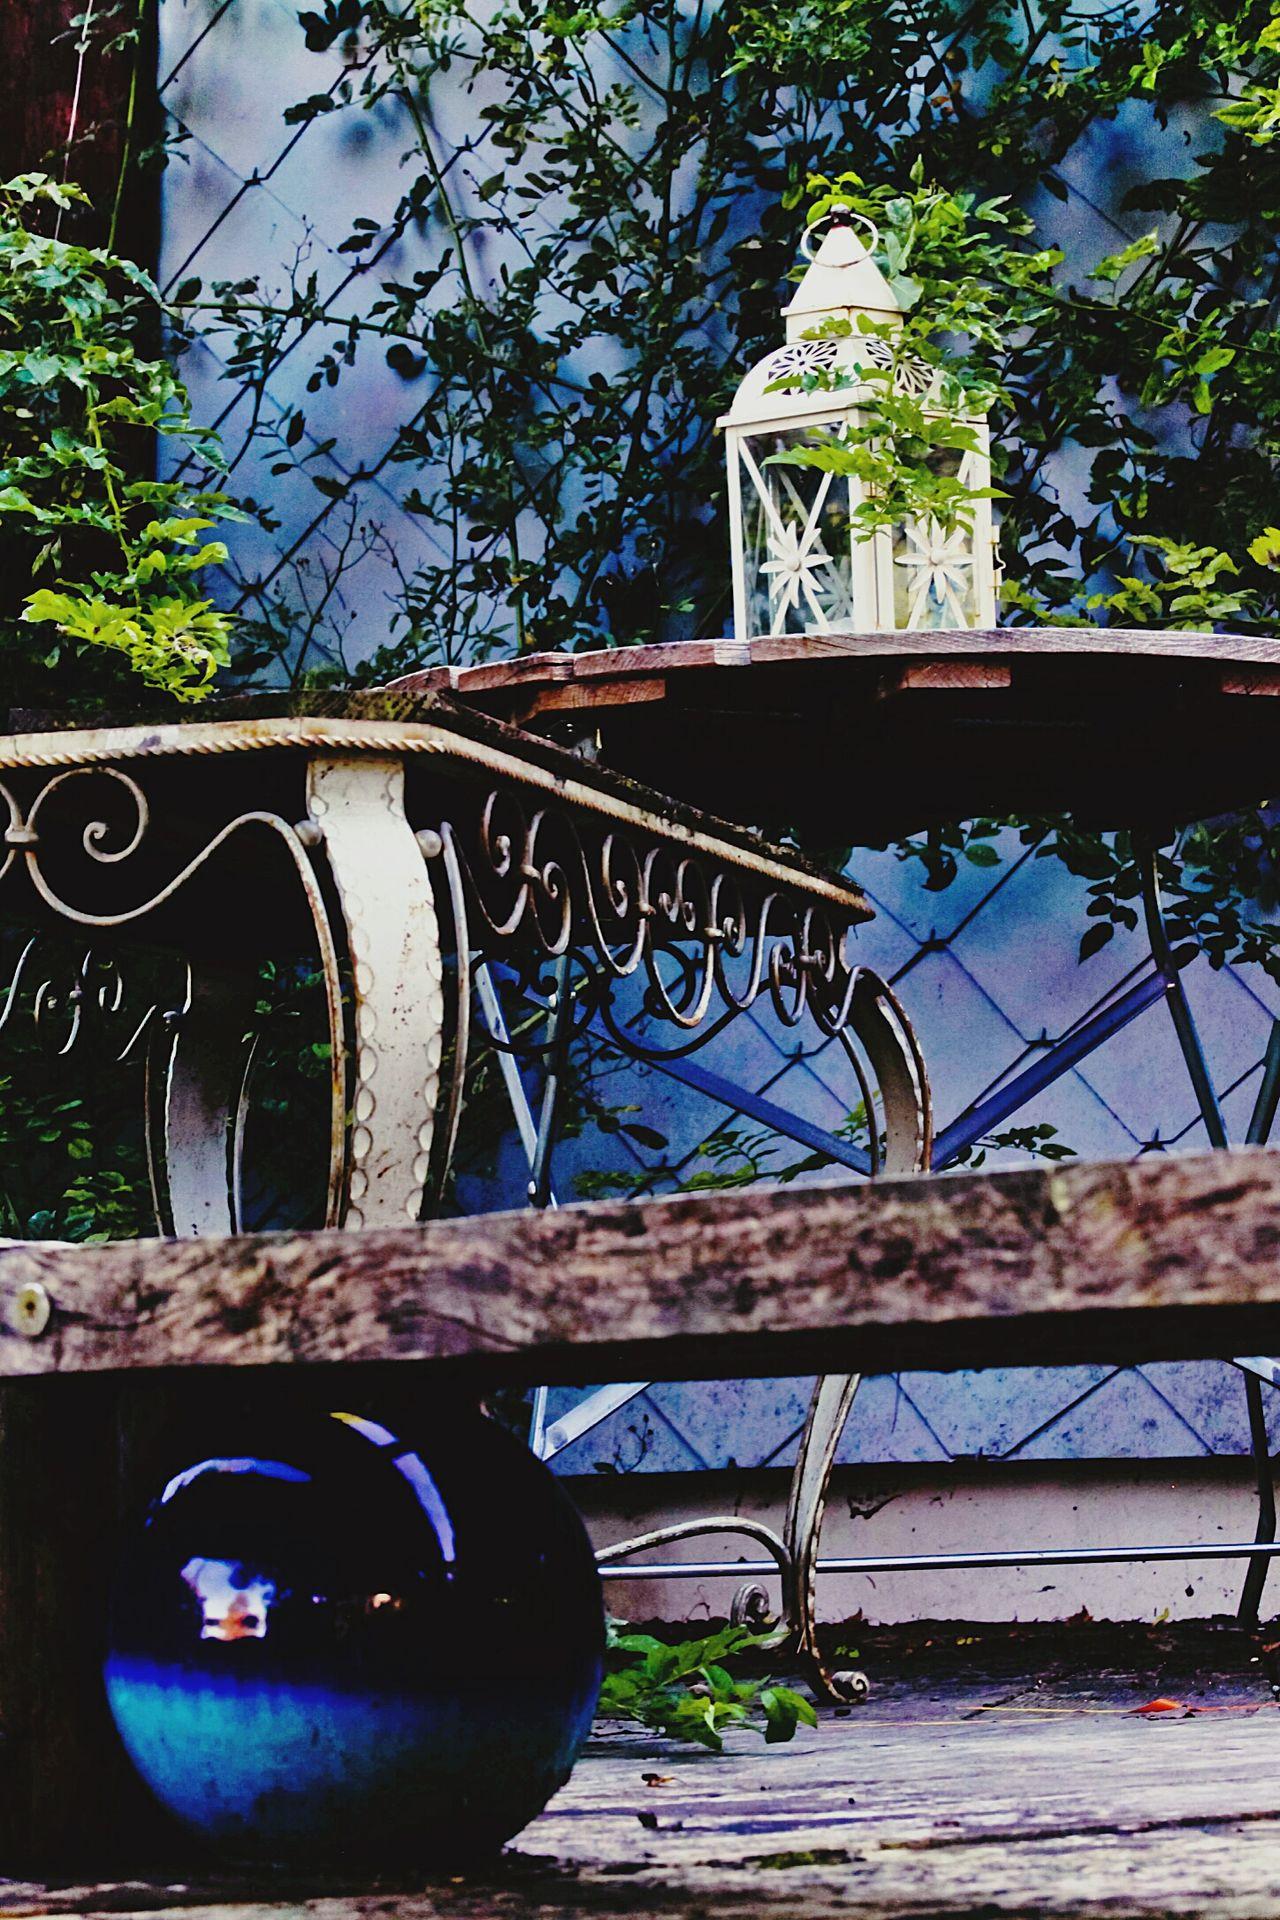 Garden Garden Photography Outdoor Beauty Decoration Lantern Table Vintage Rusty Ornaments Shabby